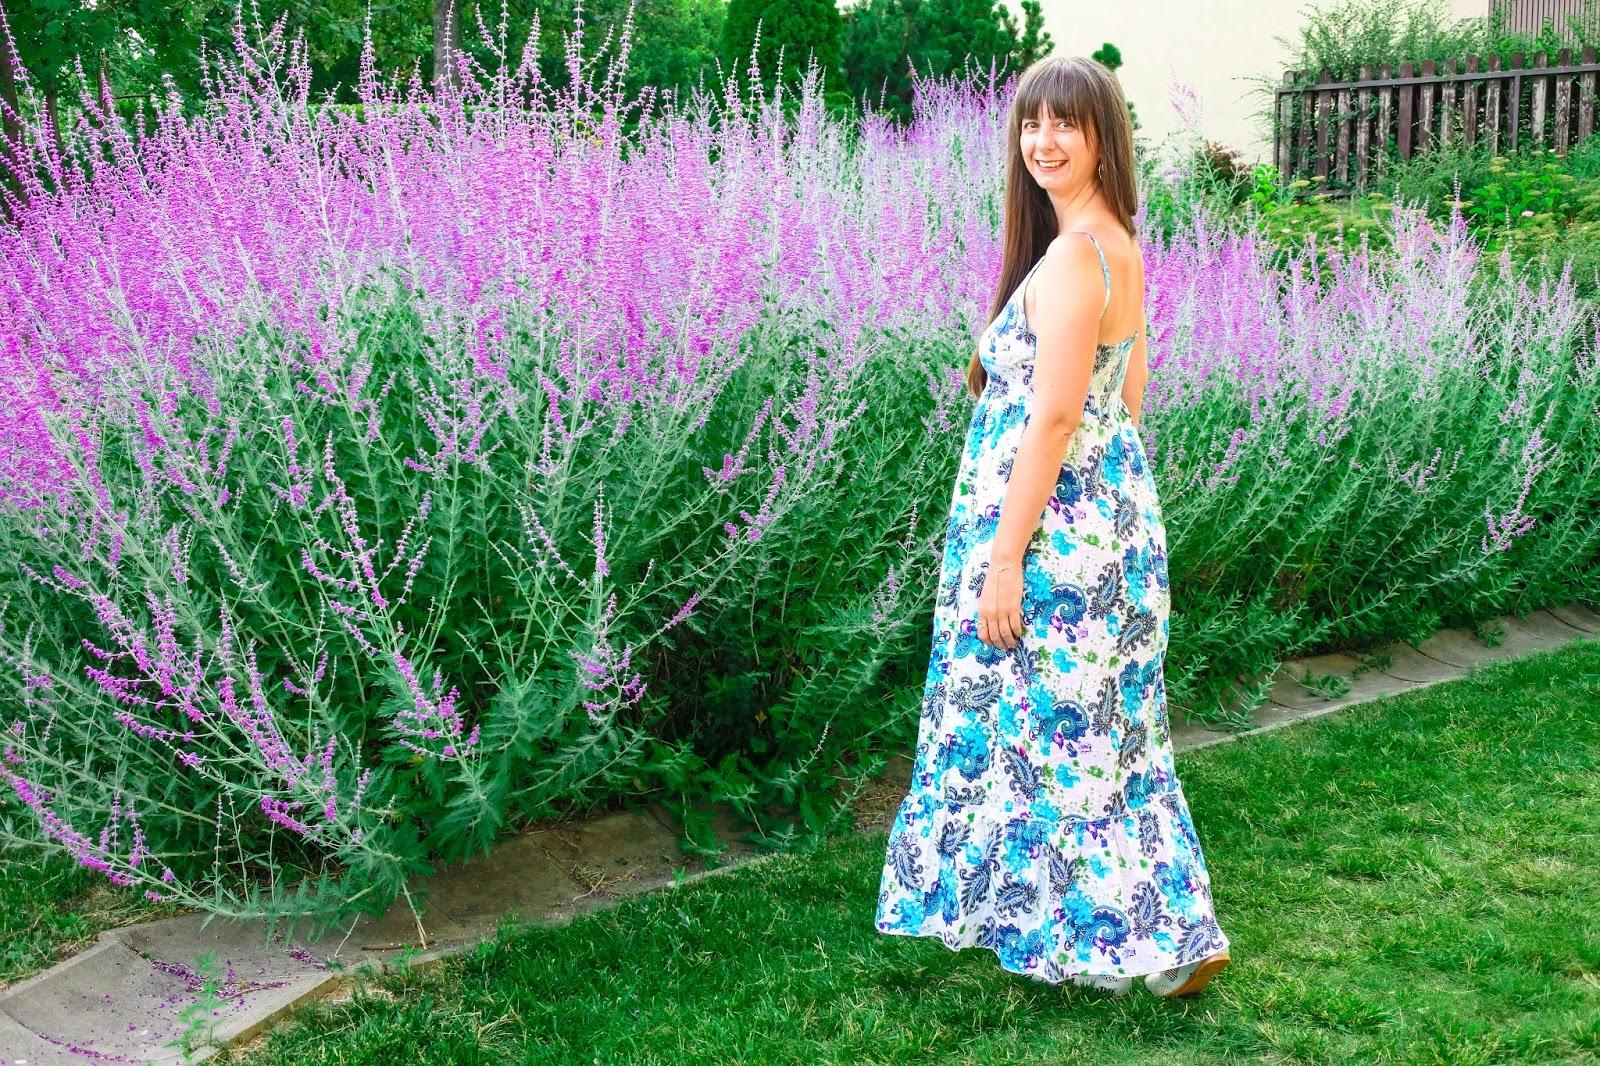 https://sanjaburgundy.blogspot.com/2019/07/violet.html